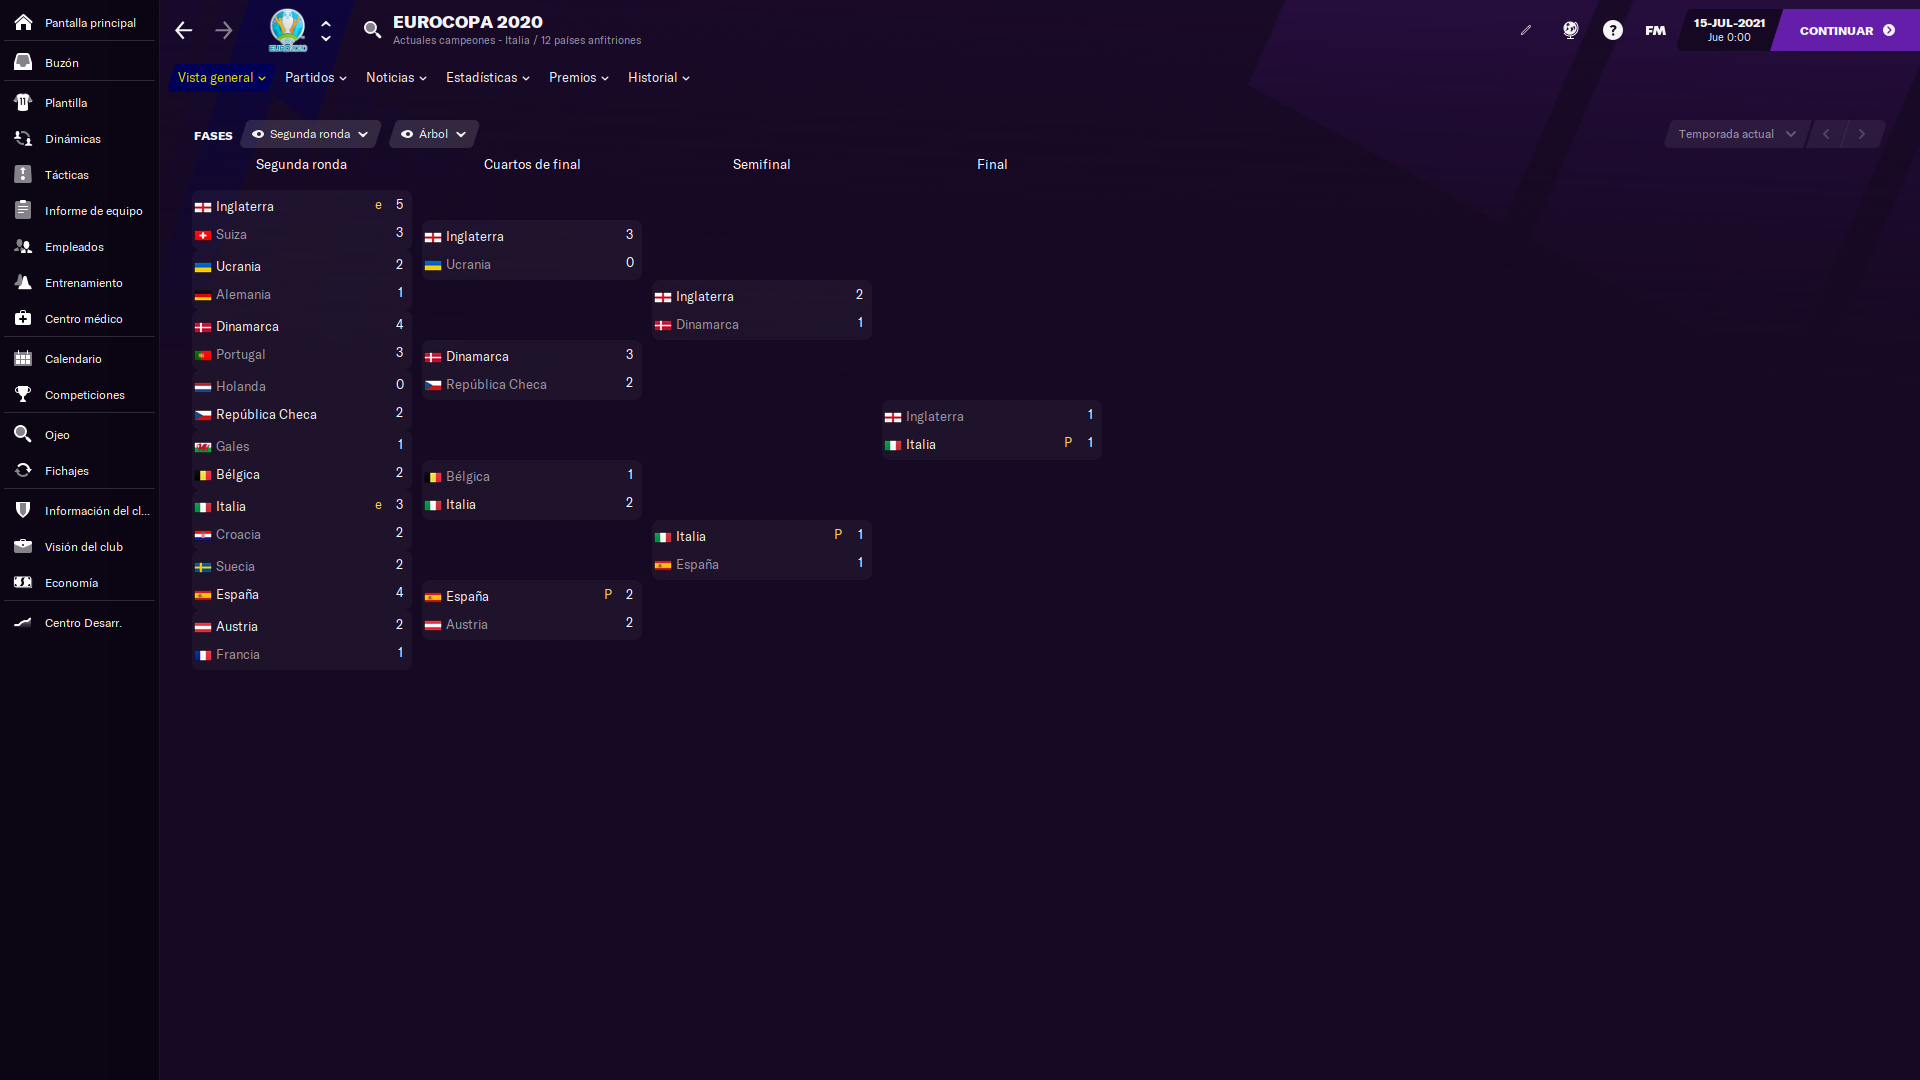 Eurocopa-Fases-2